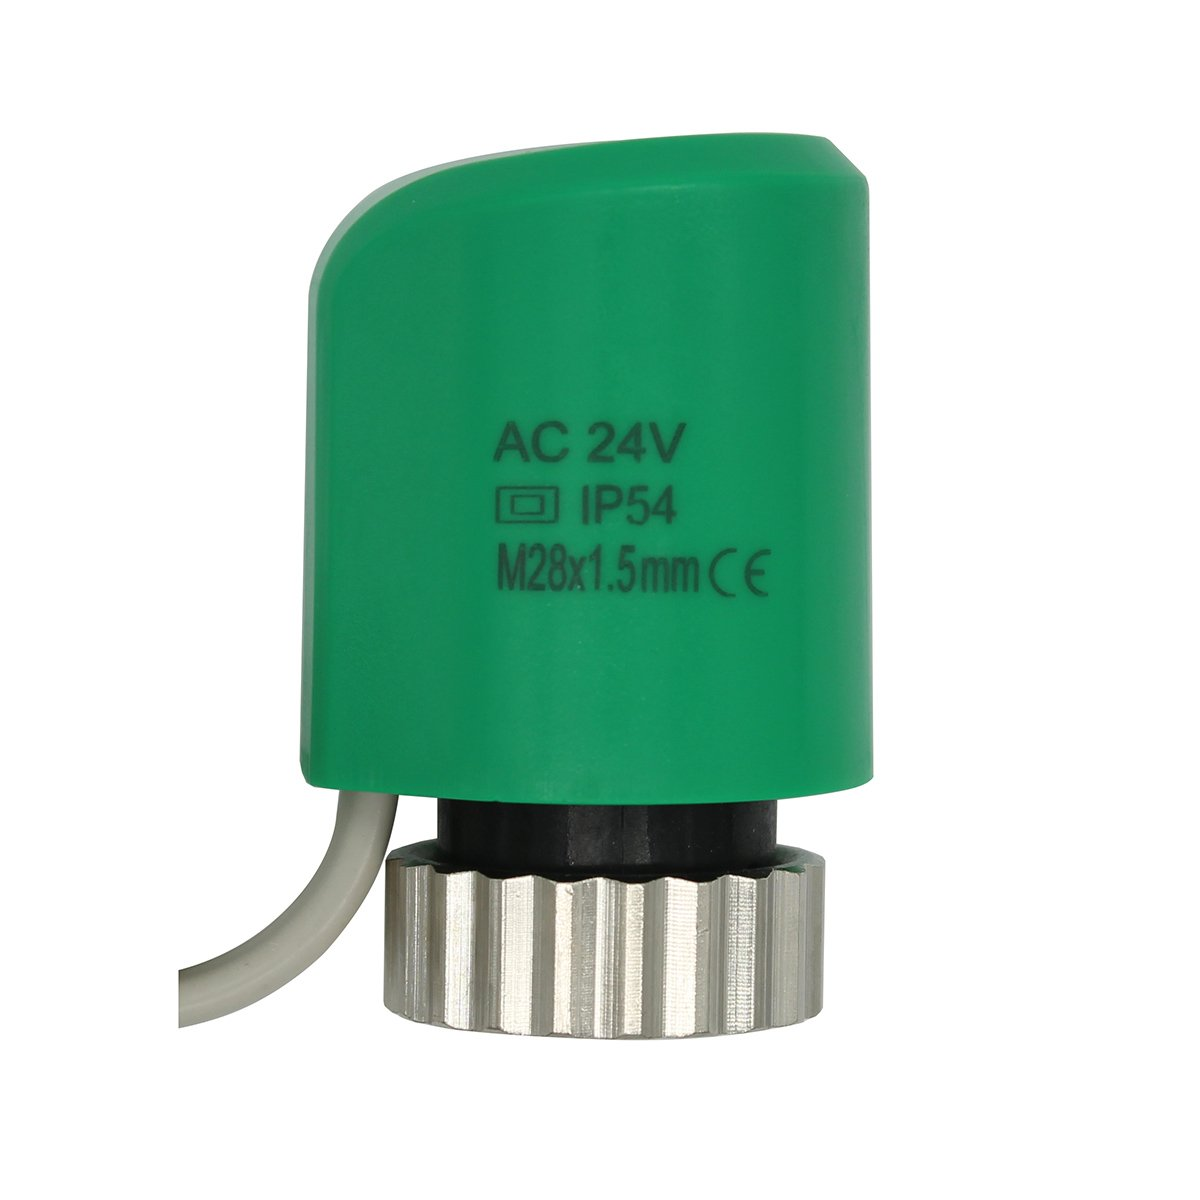 servomoteur thermique M28 x 1.5mm - AC 220V AC/DC 24V NO NC 220V normalement ouvert fermé (24V normalement ouvert) Yisheng